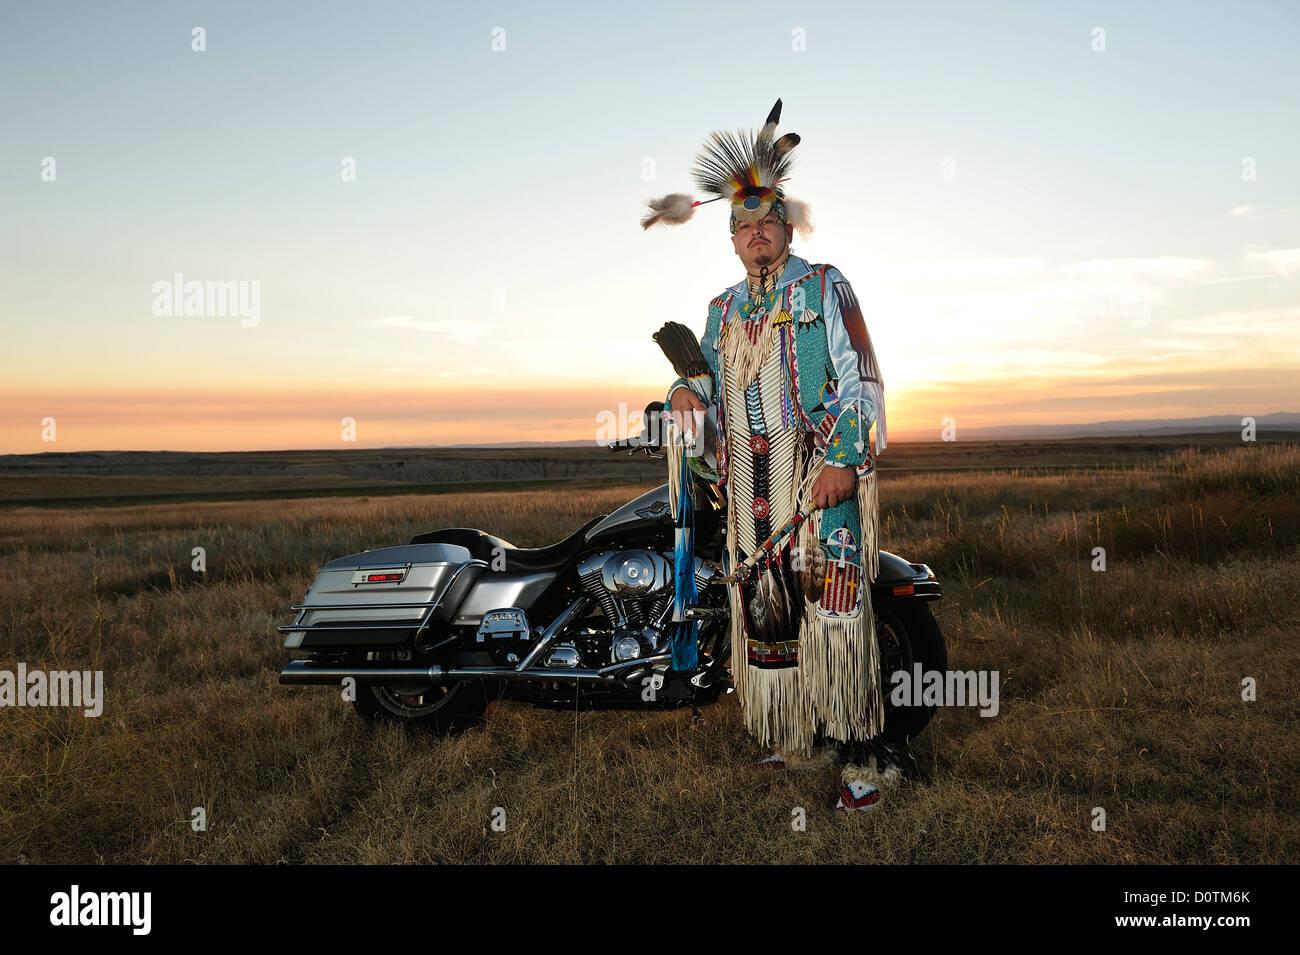 Sioux, Badlands, Stephen Yellowhawk, bike, badland, warriors, feathers, regalia, American Native, Lakota, South - Stock Image